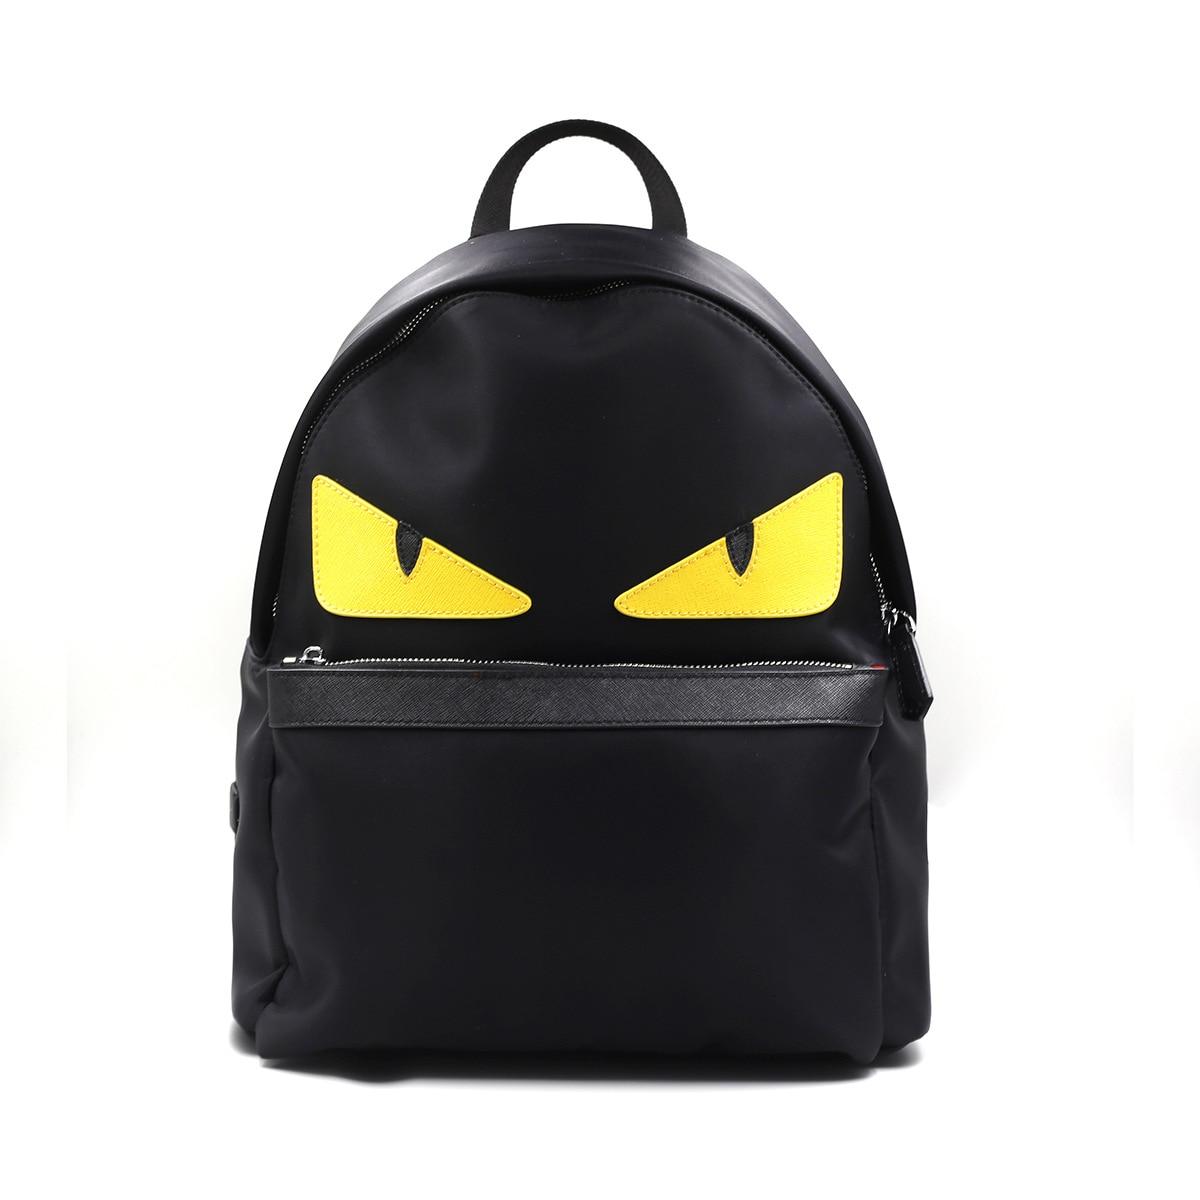 ФОТО Women Little Monster Backpack Eye Men Waterproof Import Oxfo Bags Printing School Bag for Teenagers Mochila Escolar Black